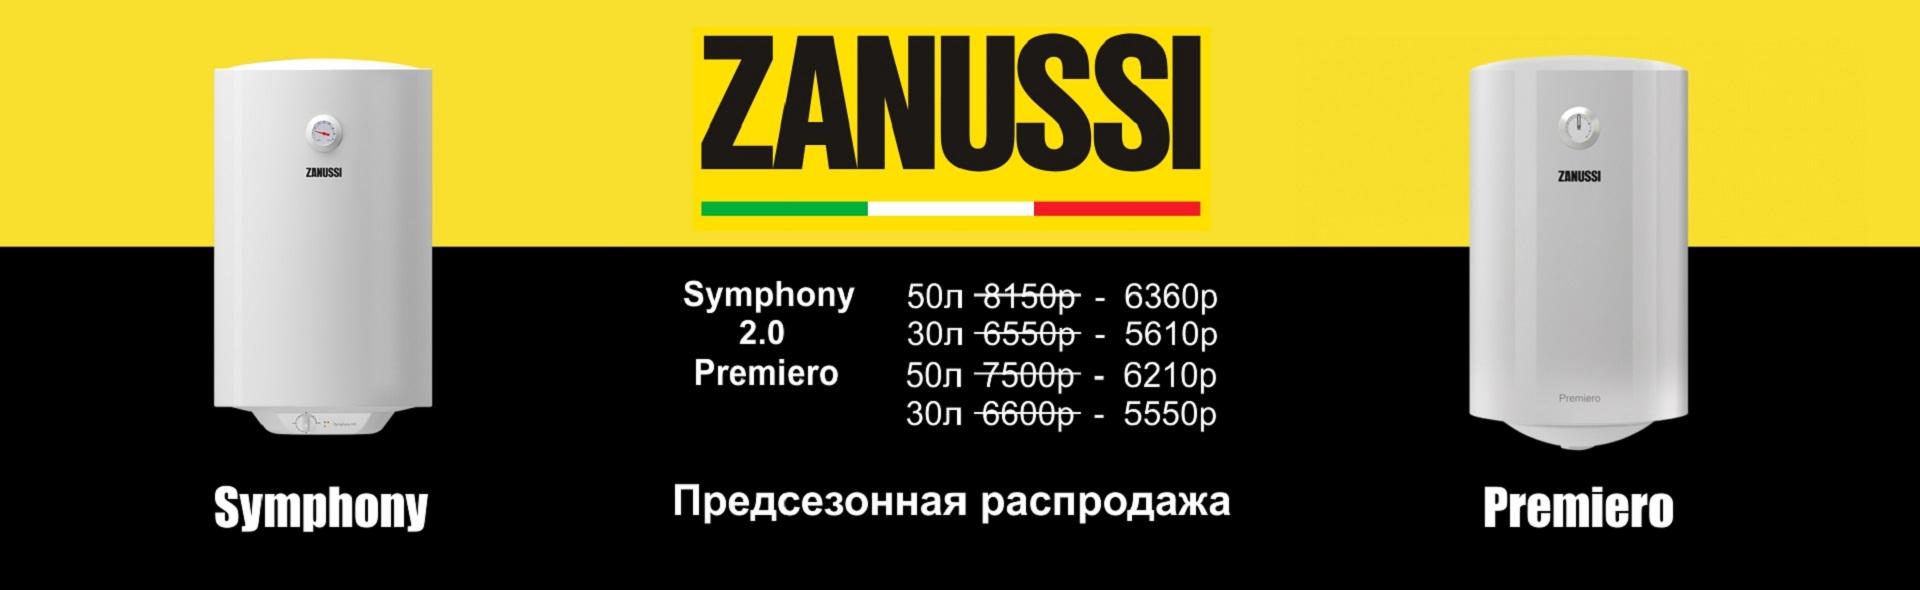 Zanussi20203